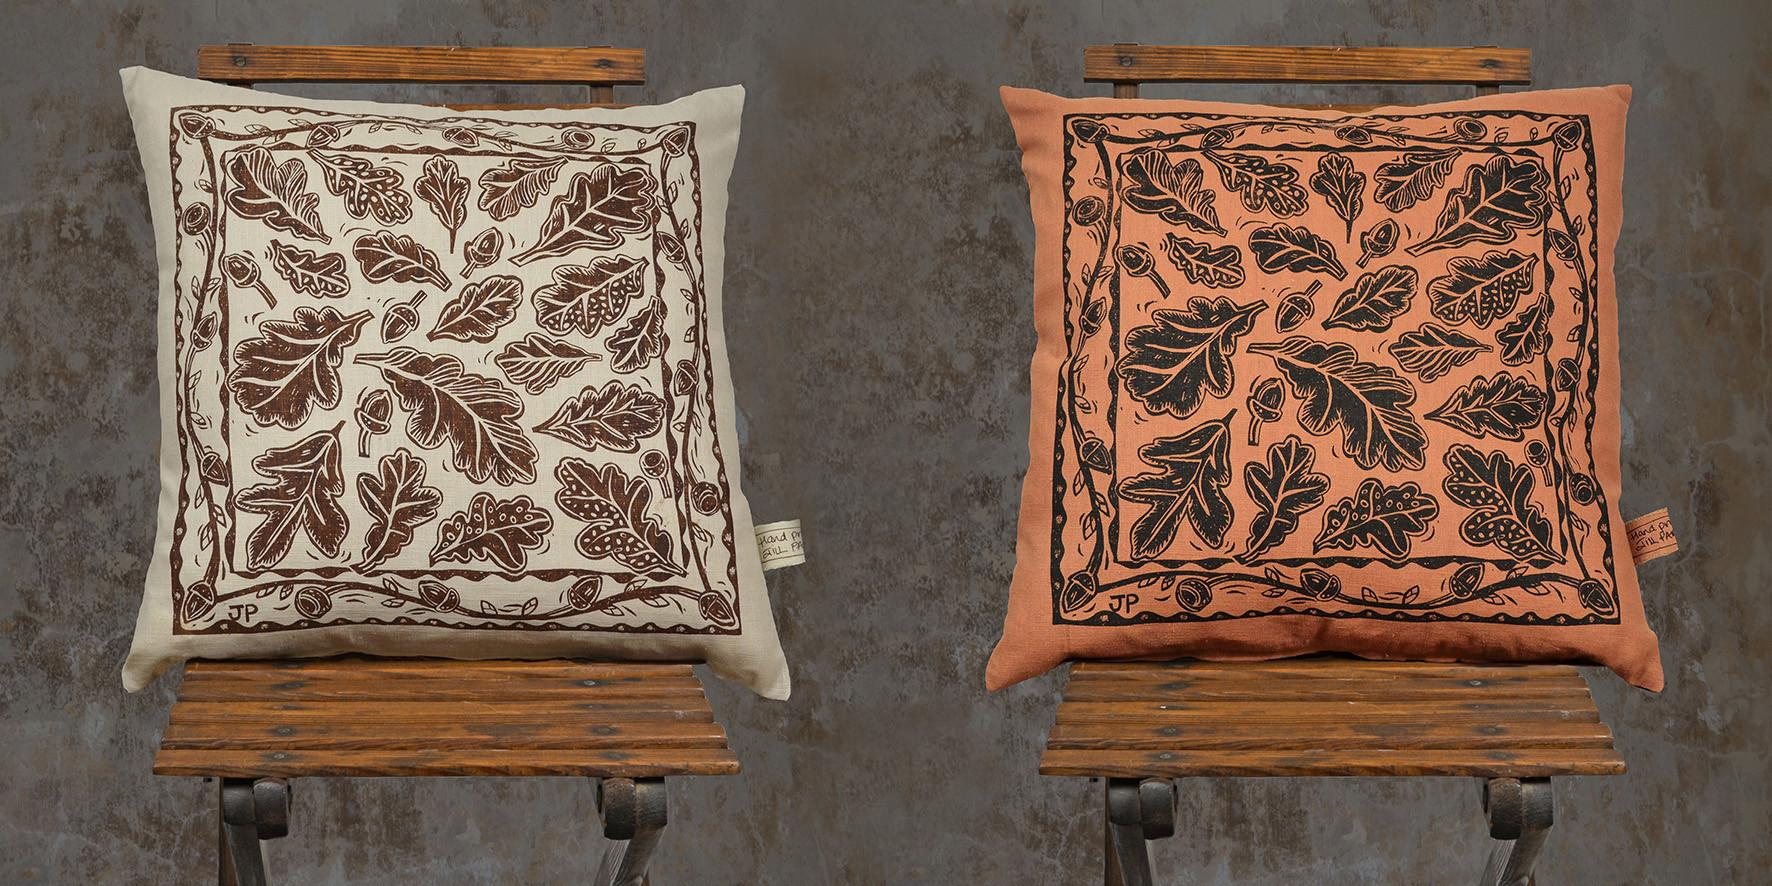 Jill Pargeter | printed textiles | cushions